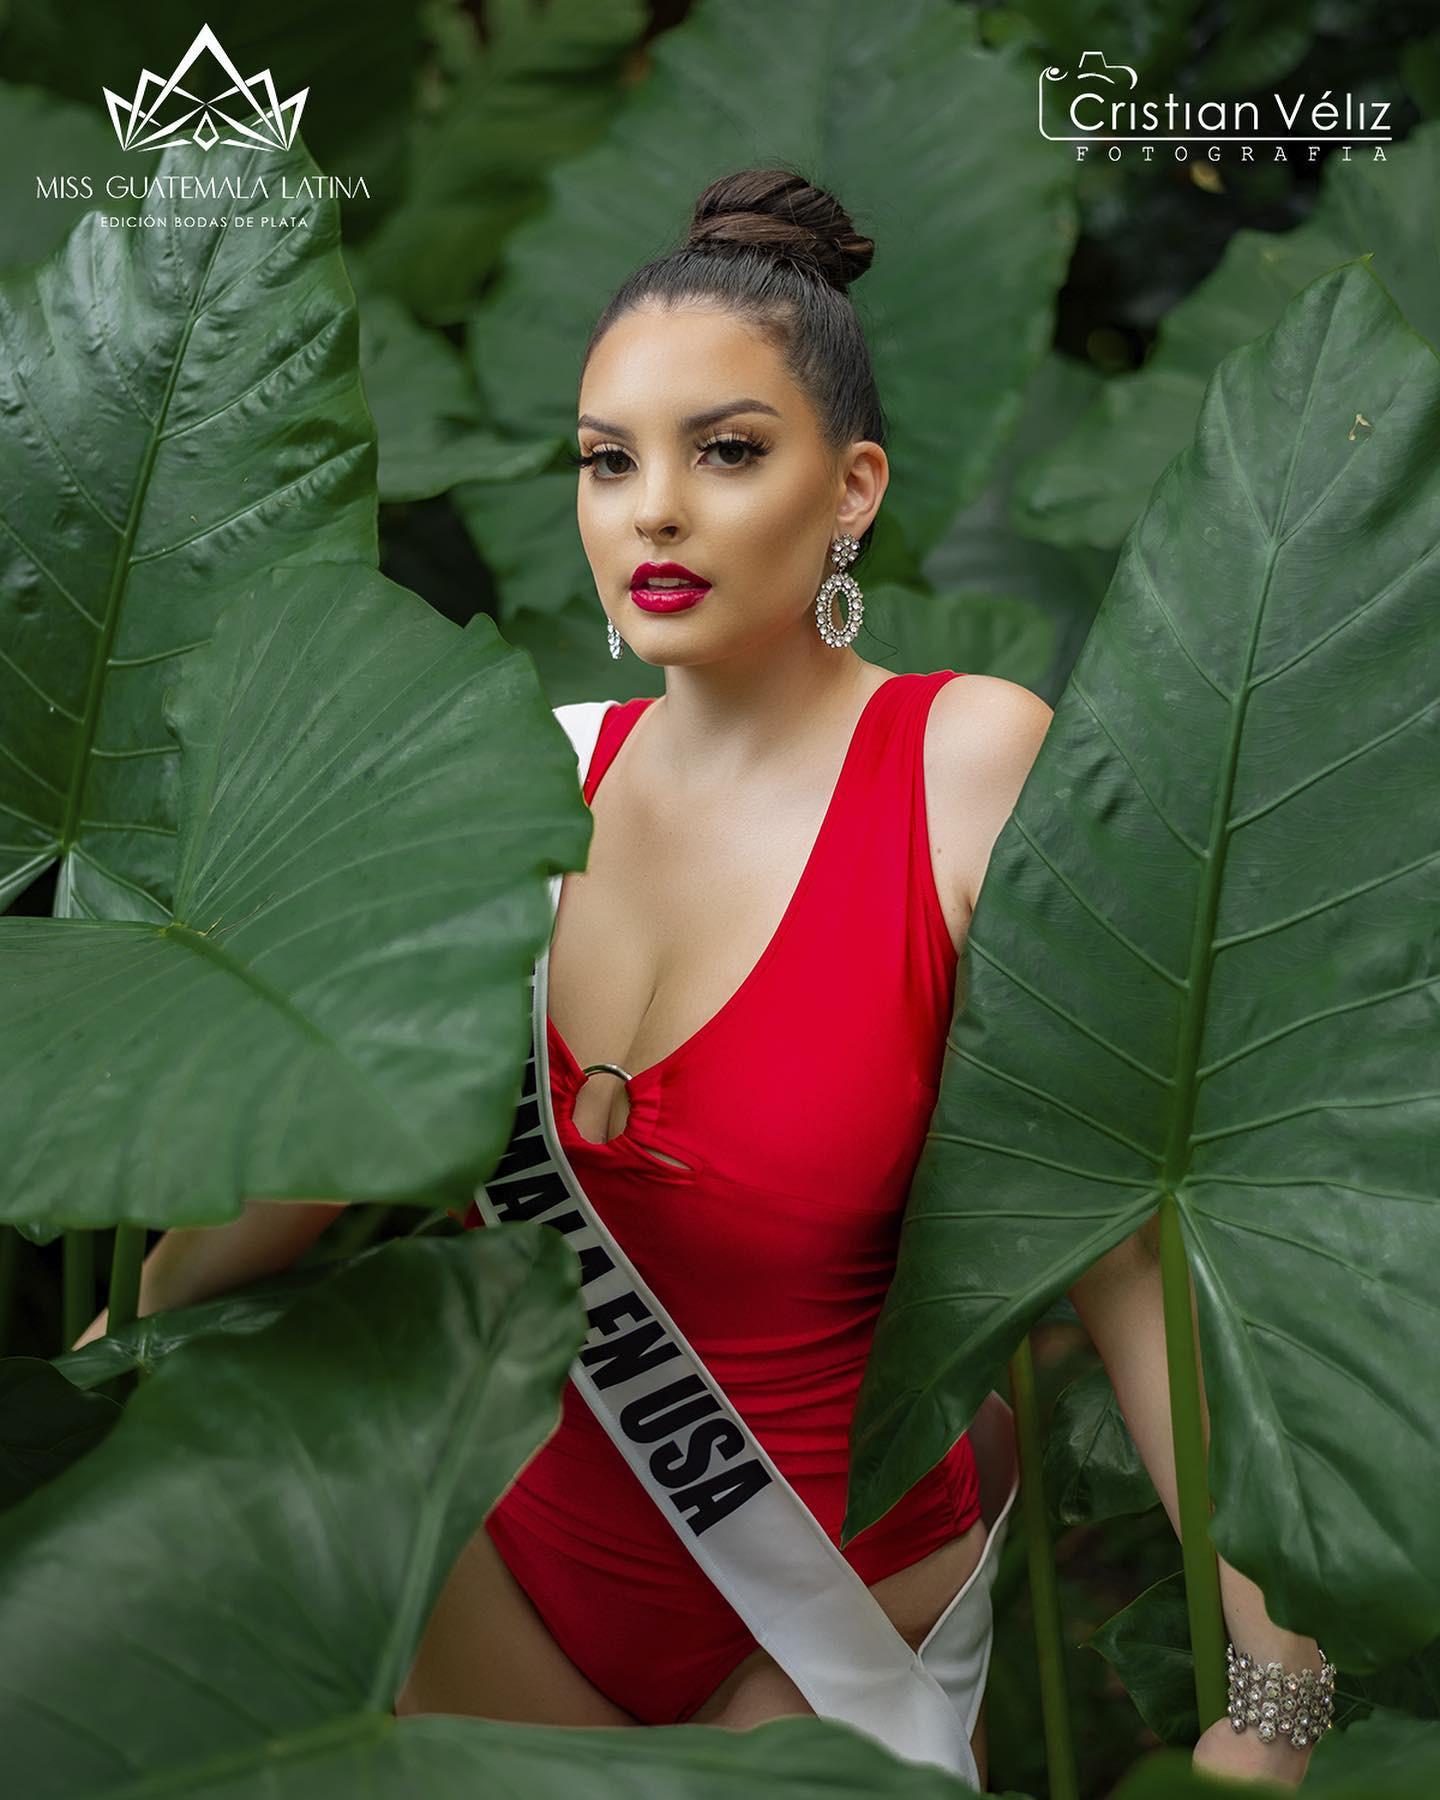 candidatas a miss guatemala latina 2021. final: 30 de abril. - Página 4 B3u9HX